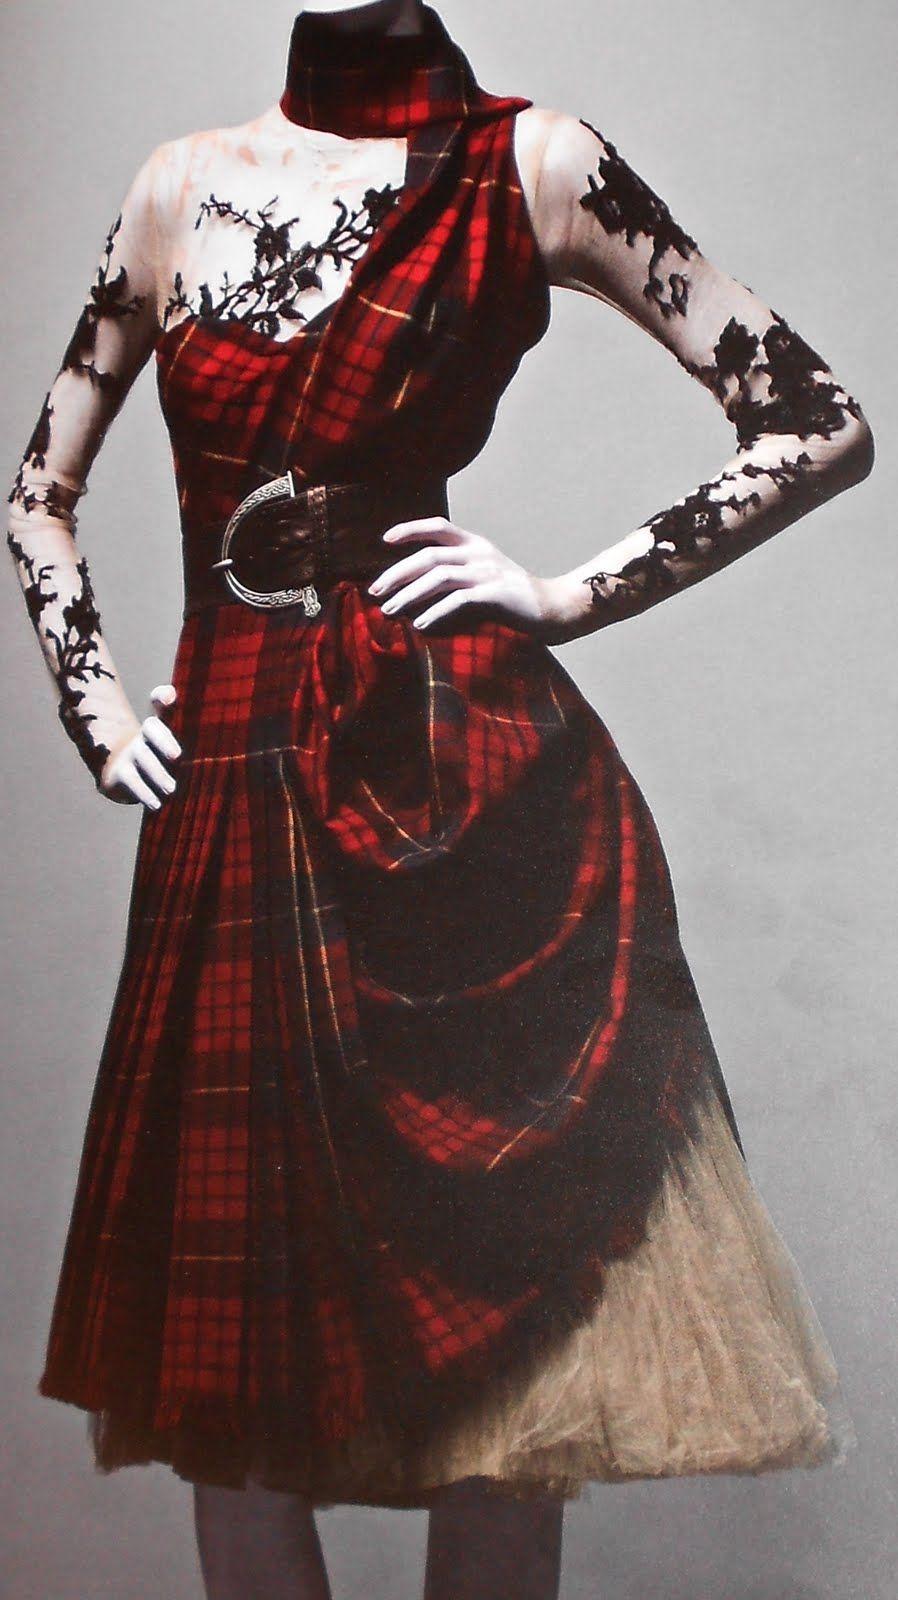 Traditional scottish dress artoholics awareness fashion for Scottish wedding dresses with tartan